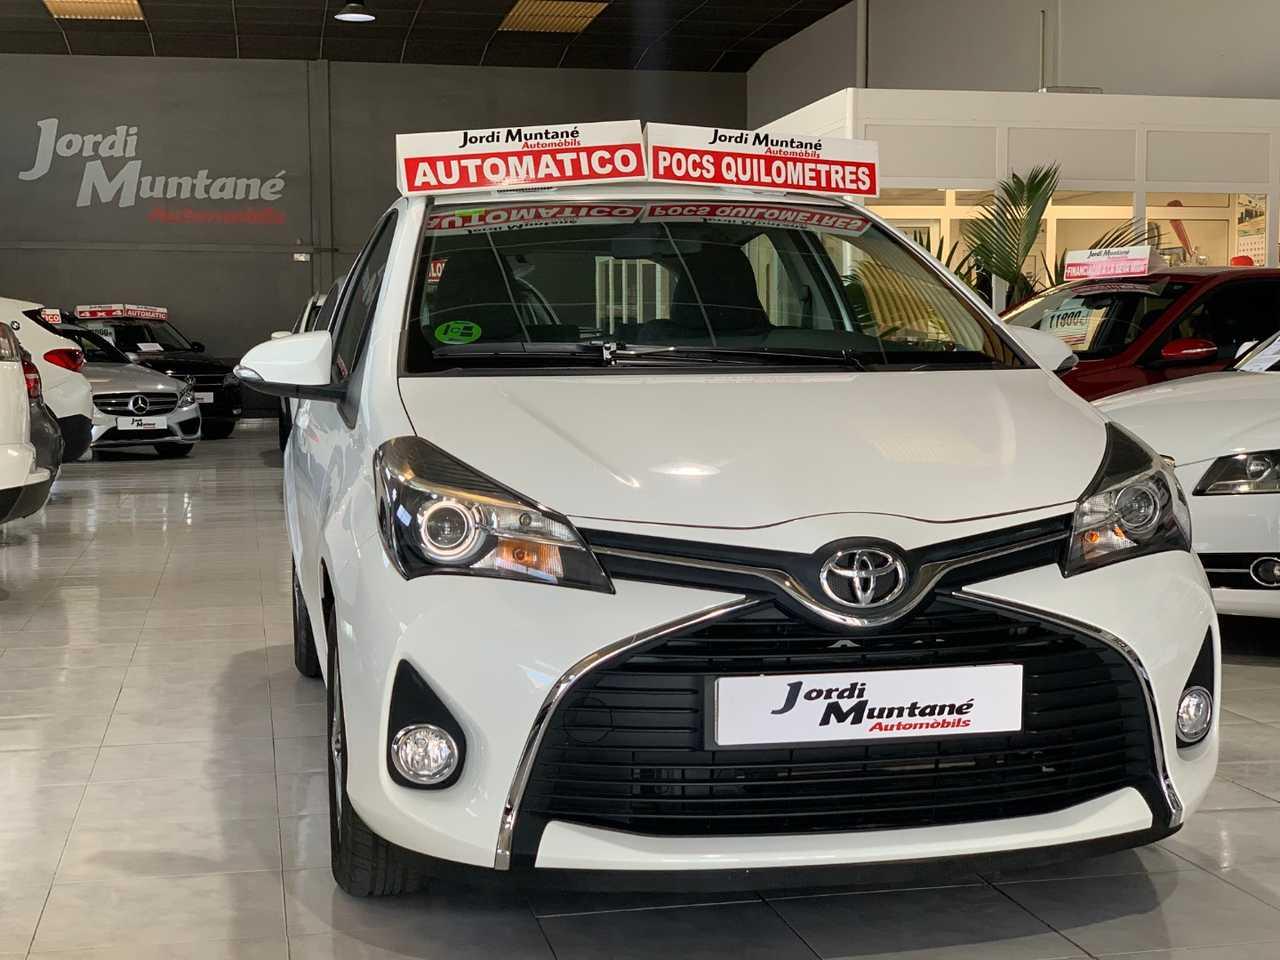 Toyota Yaris 1.3 VVTI 100cv -. '' Solo 8.068 KM '' .- Automático 5 Puertas -.